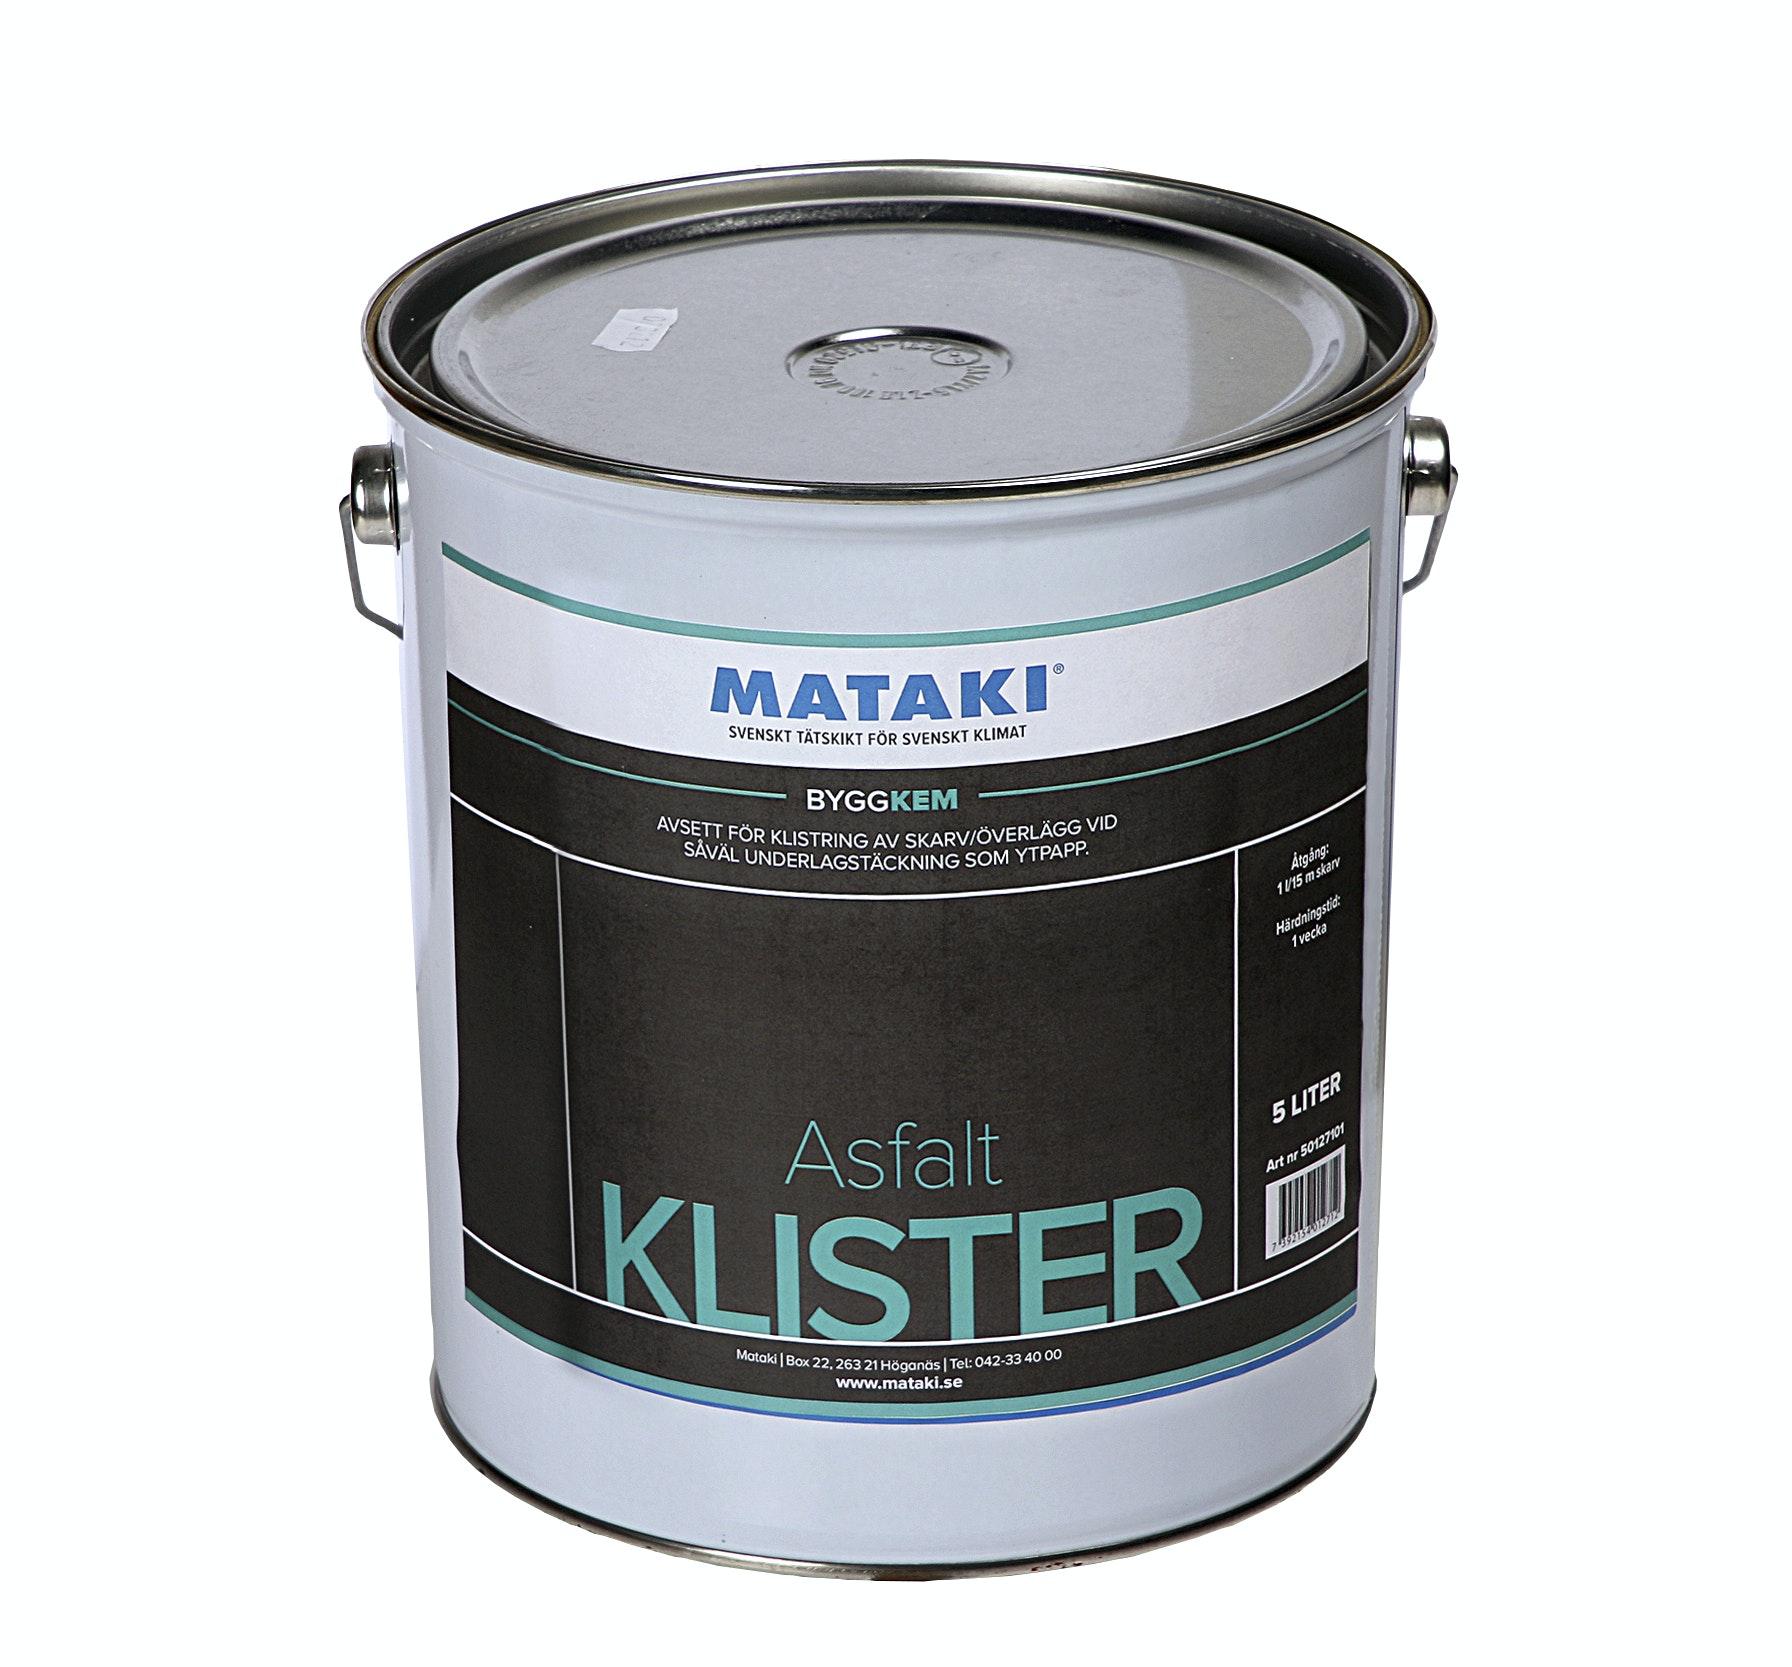 Asfaltsklister Mataki 5 liter